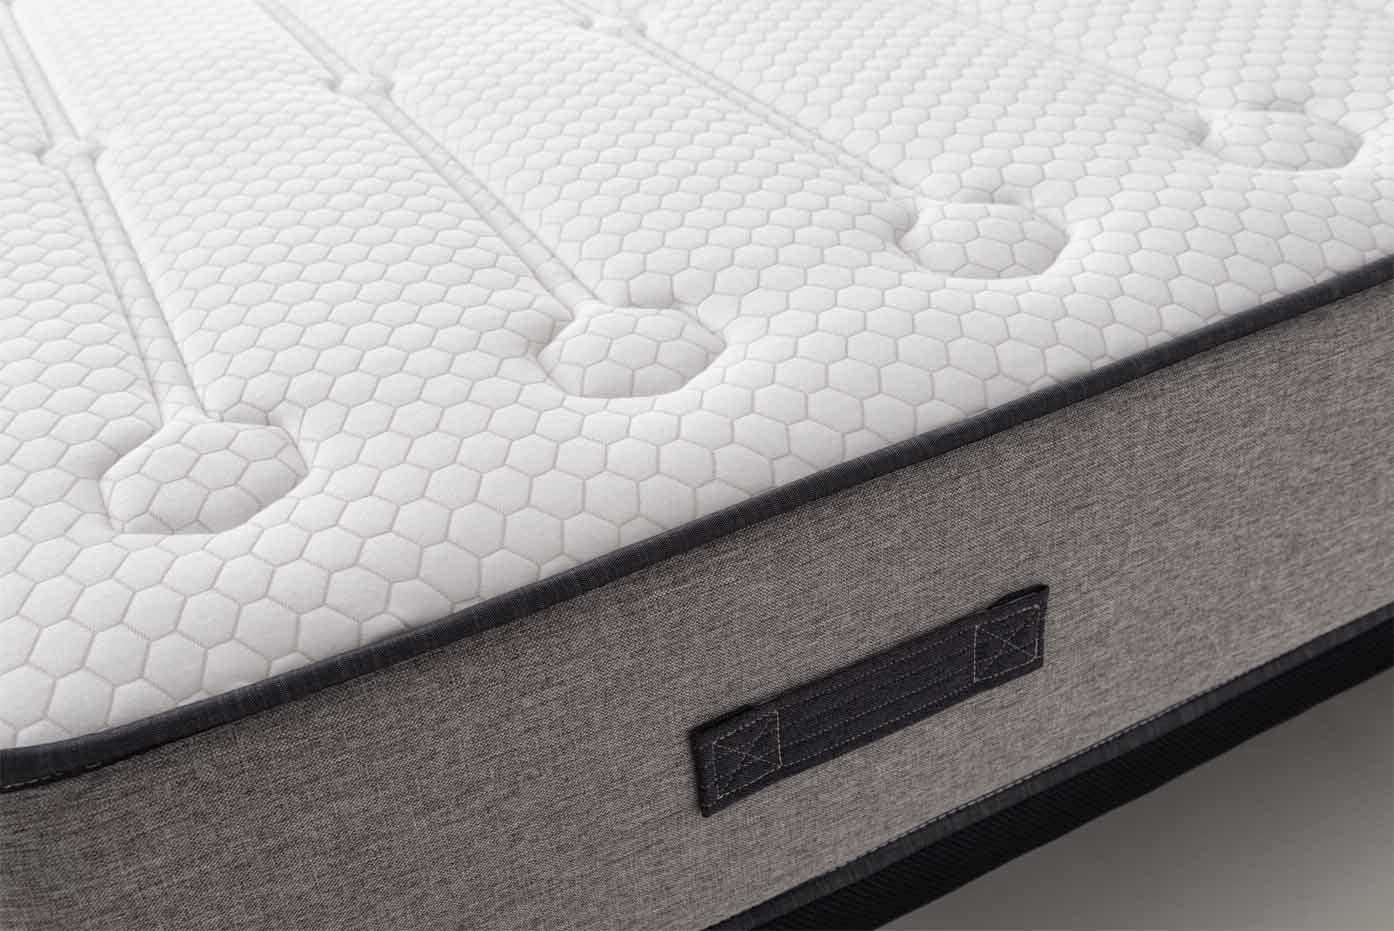 MAXCOLCHON Pack Colchon Sport Fresh-Gel + Almohada + Canape Abatible 135x190: Amazon.es: Hogar